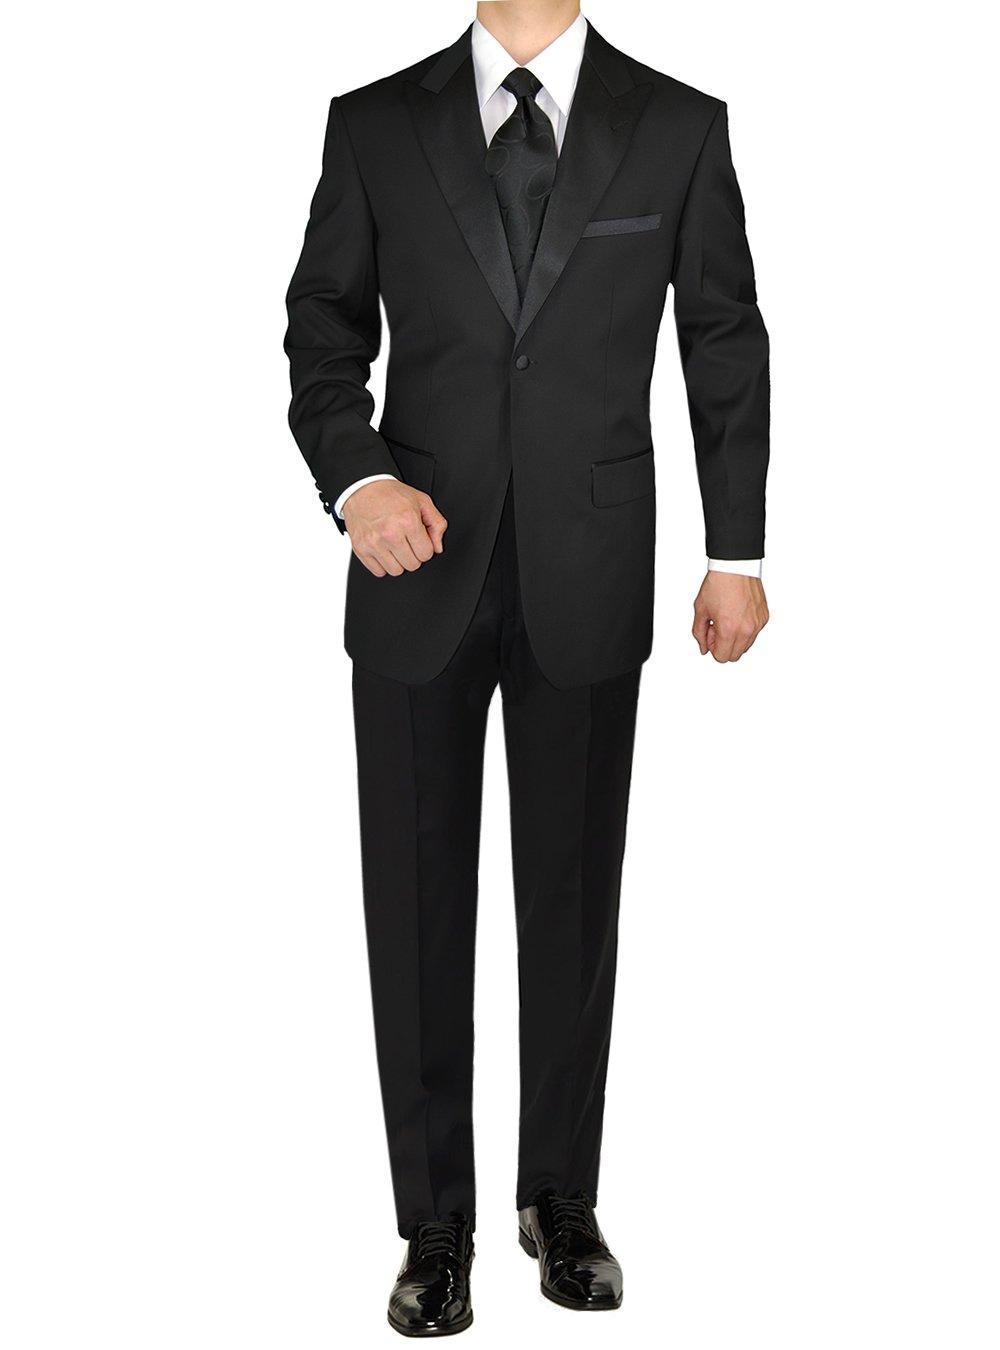 GN GIORGIO NAPOLI Men's Tuxedo Suit 1 Button Peak Lapel Adjustable Pants Black (50 Long US / 60L EU/W 44'', Black) by GN GIORGIO NAPOLI